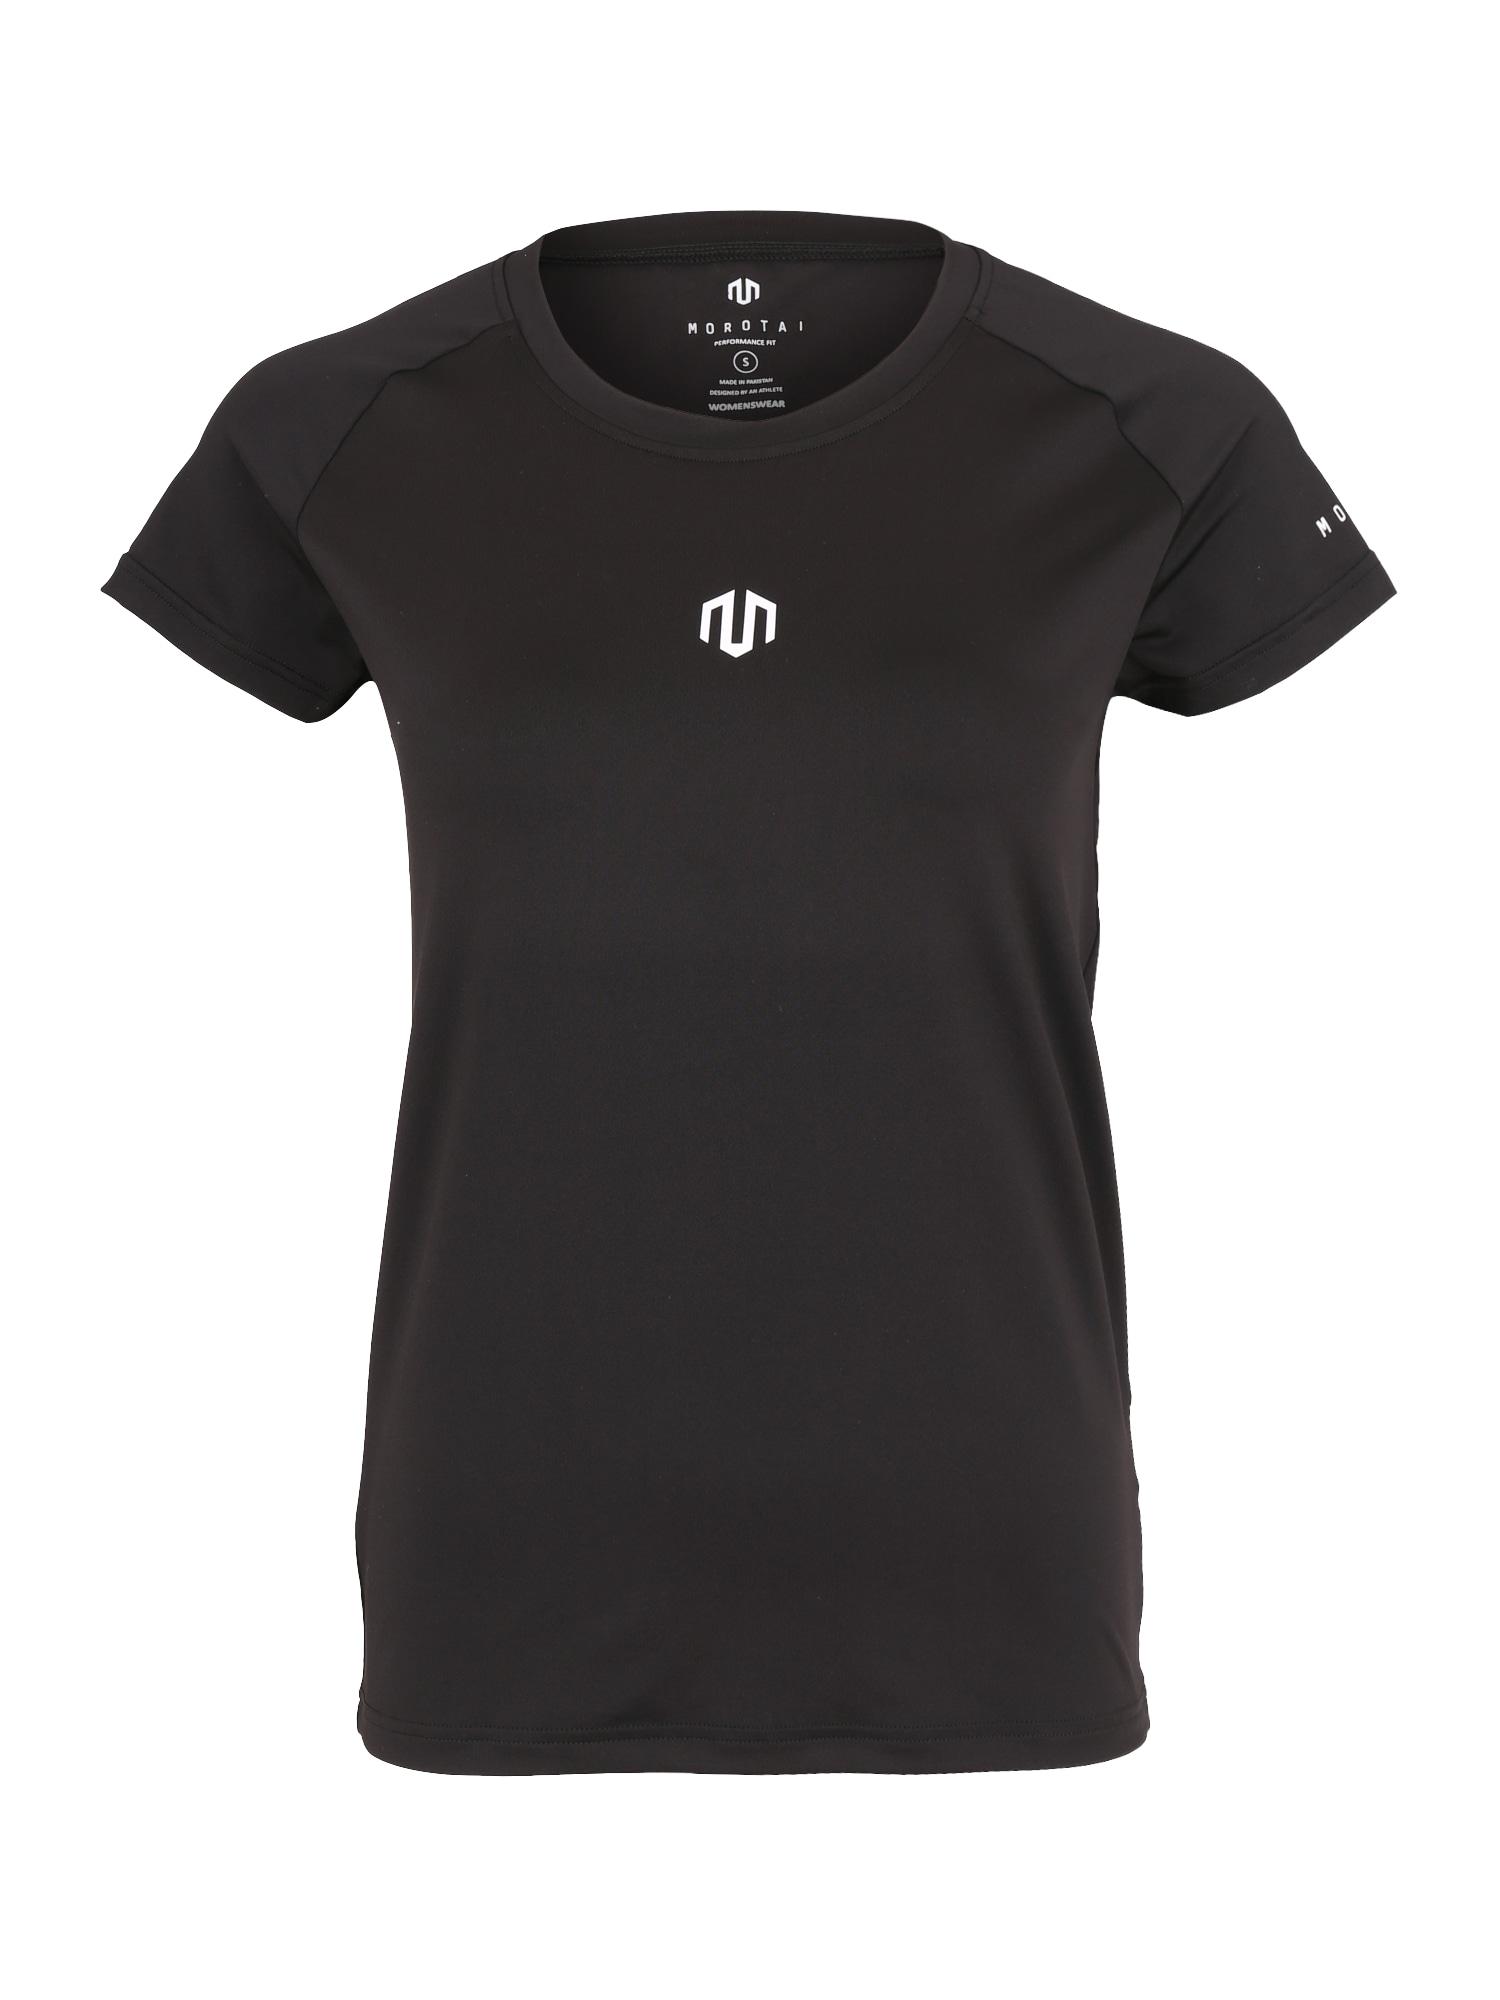 Funkční tričko NAKA Performance Hole Back černá bílá MOROTAI